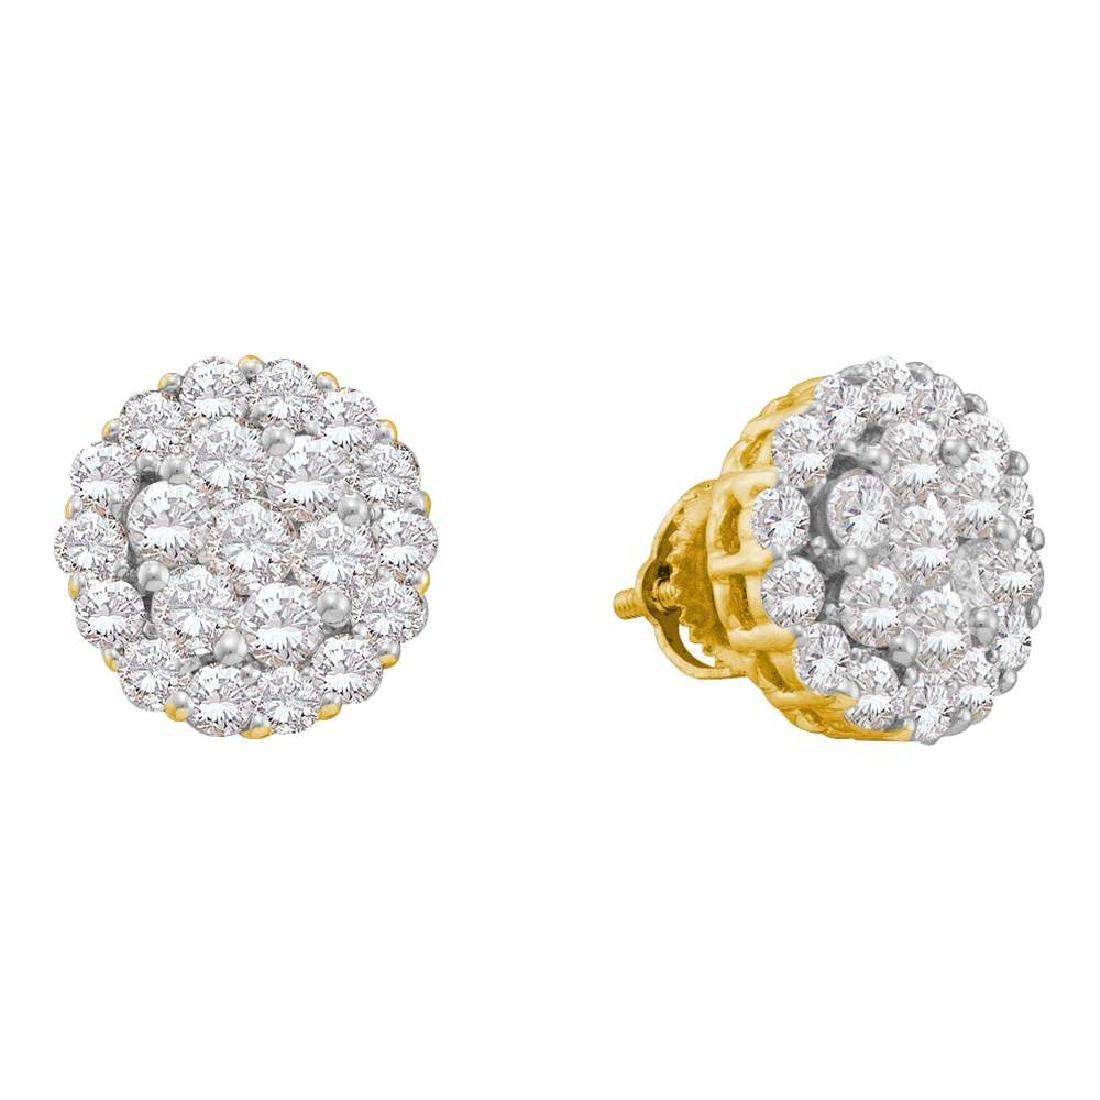 2 CTW Diamond Flower Screwback Earrings 14KT Yellow